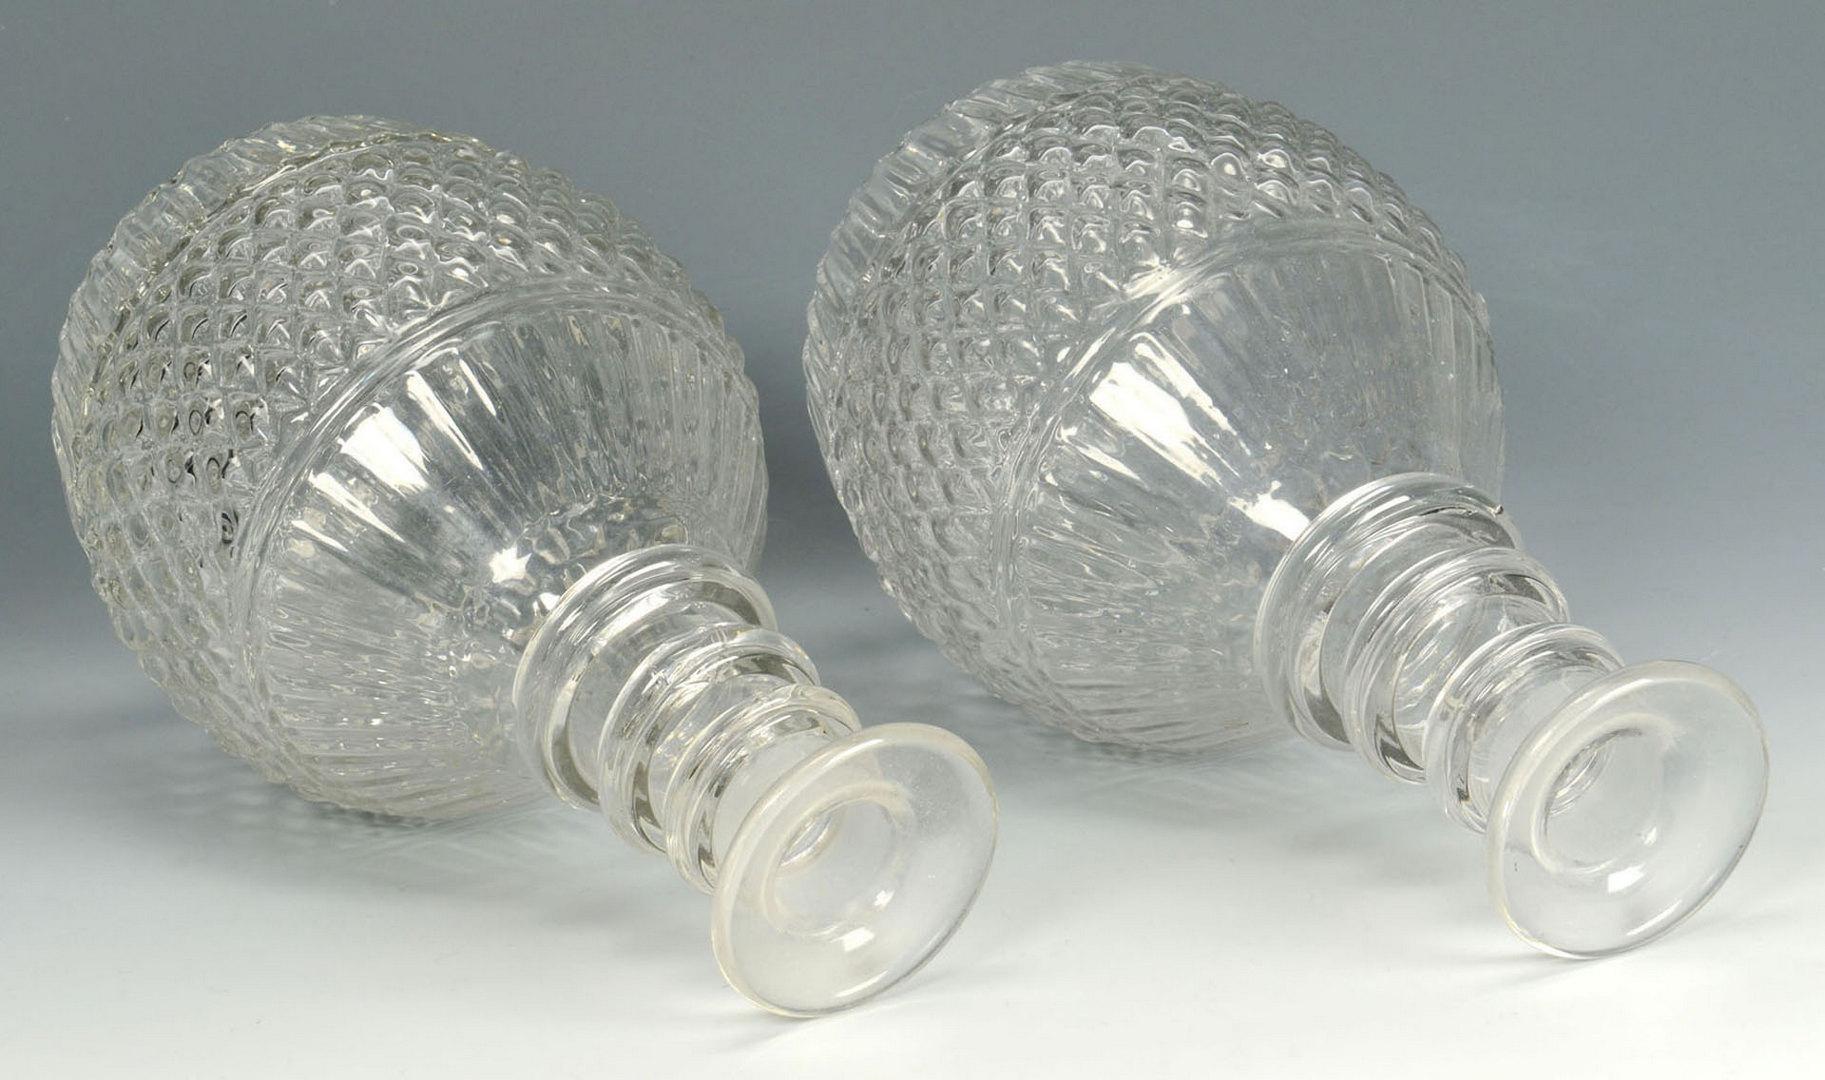 Lot 513: Pr. Blown & Cut Colorless Glass Decanters